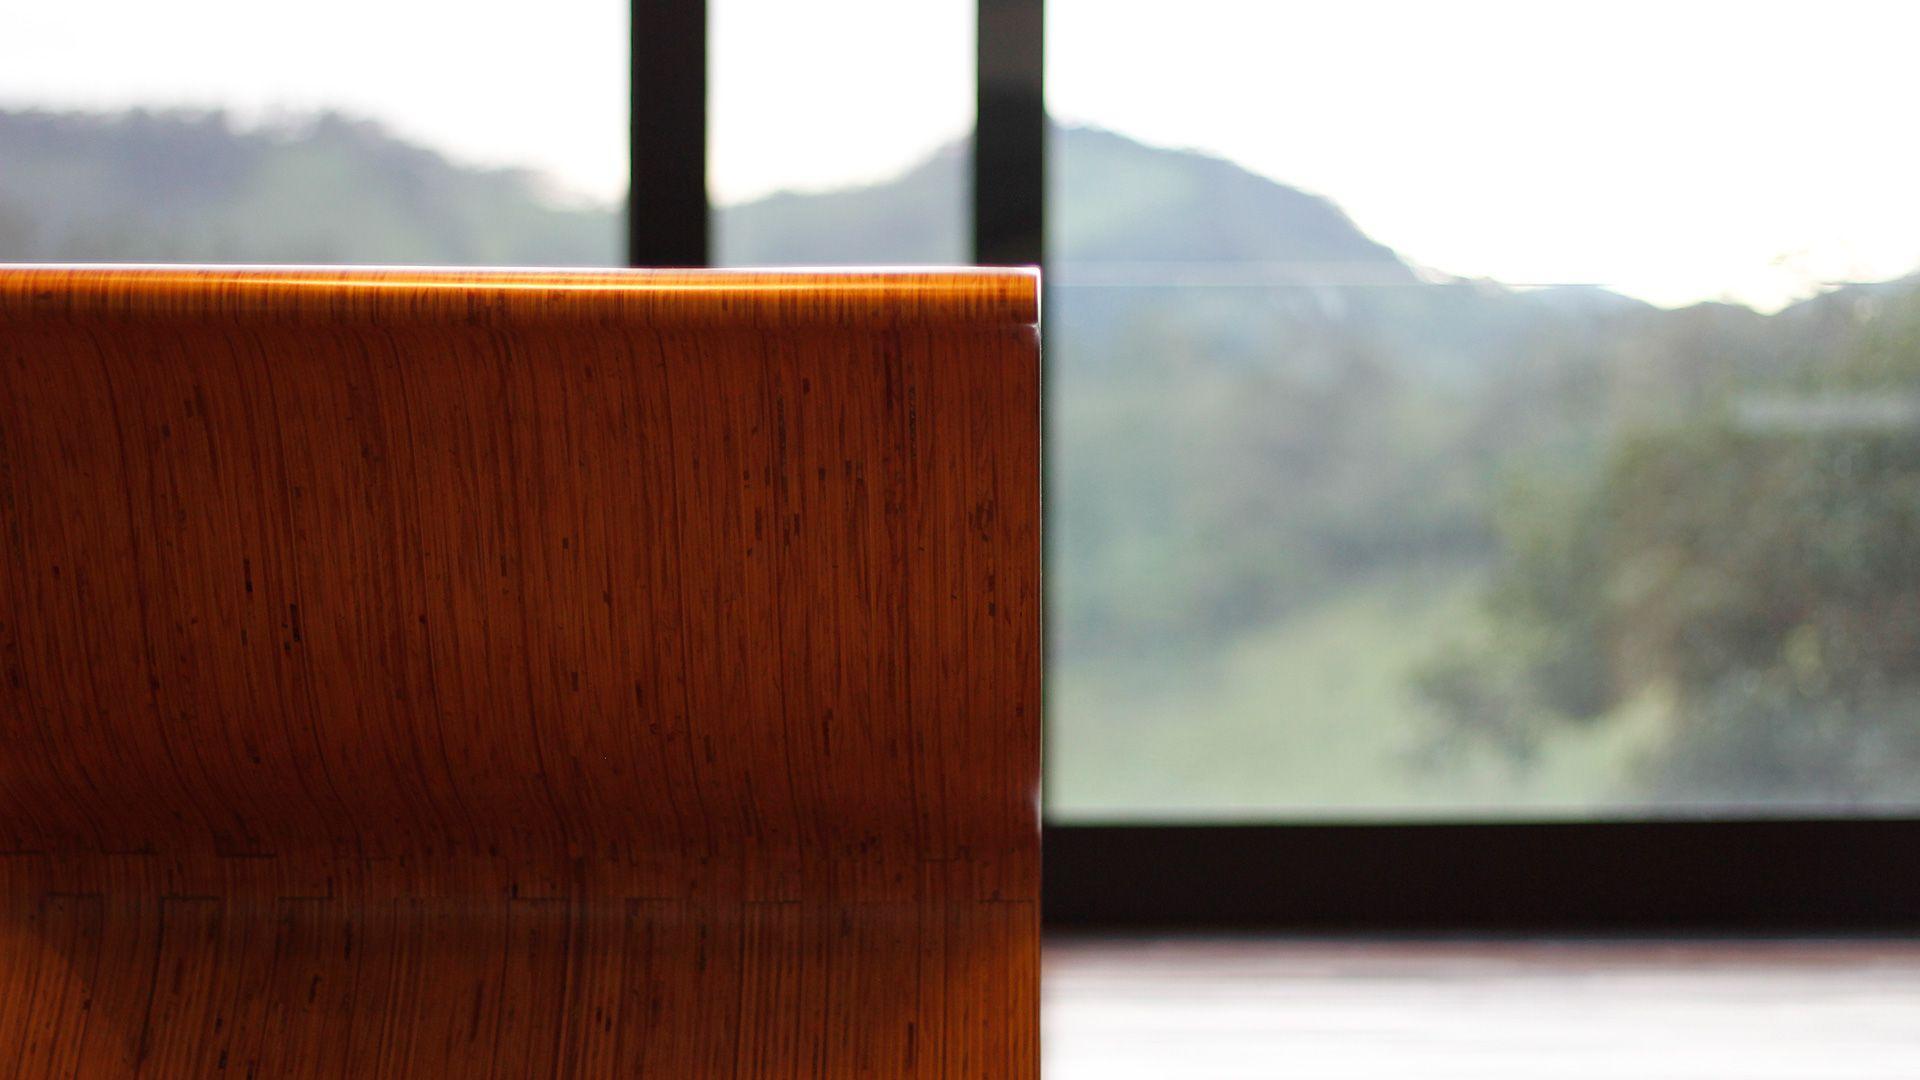 1-spa-hotel-botanique-foto-detalhe-mobiliario-visual